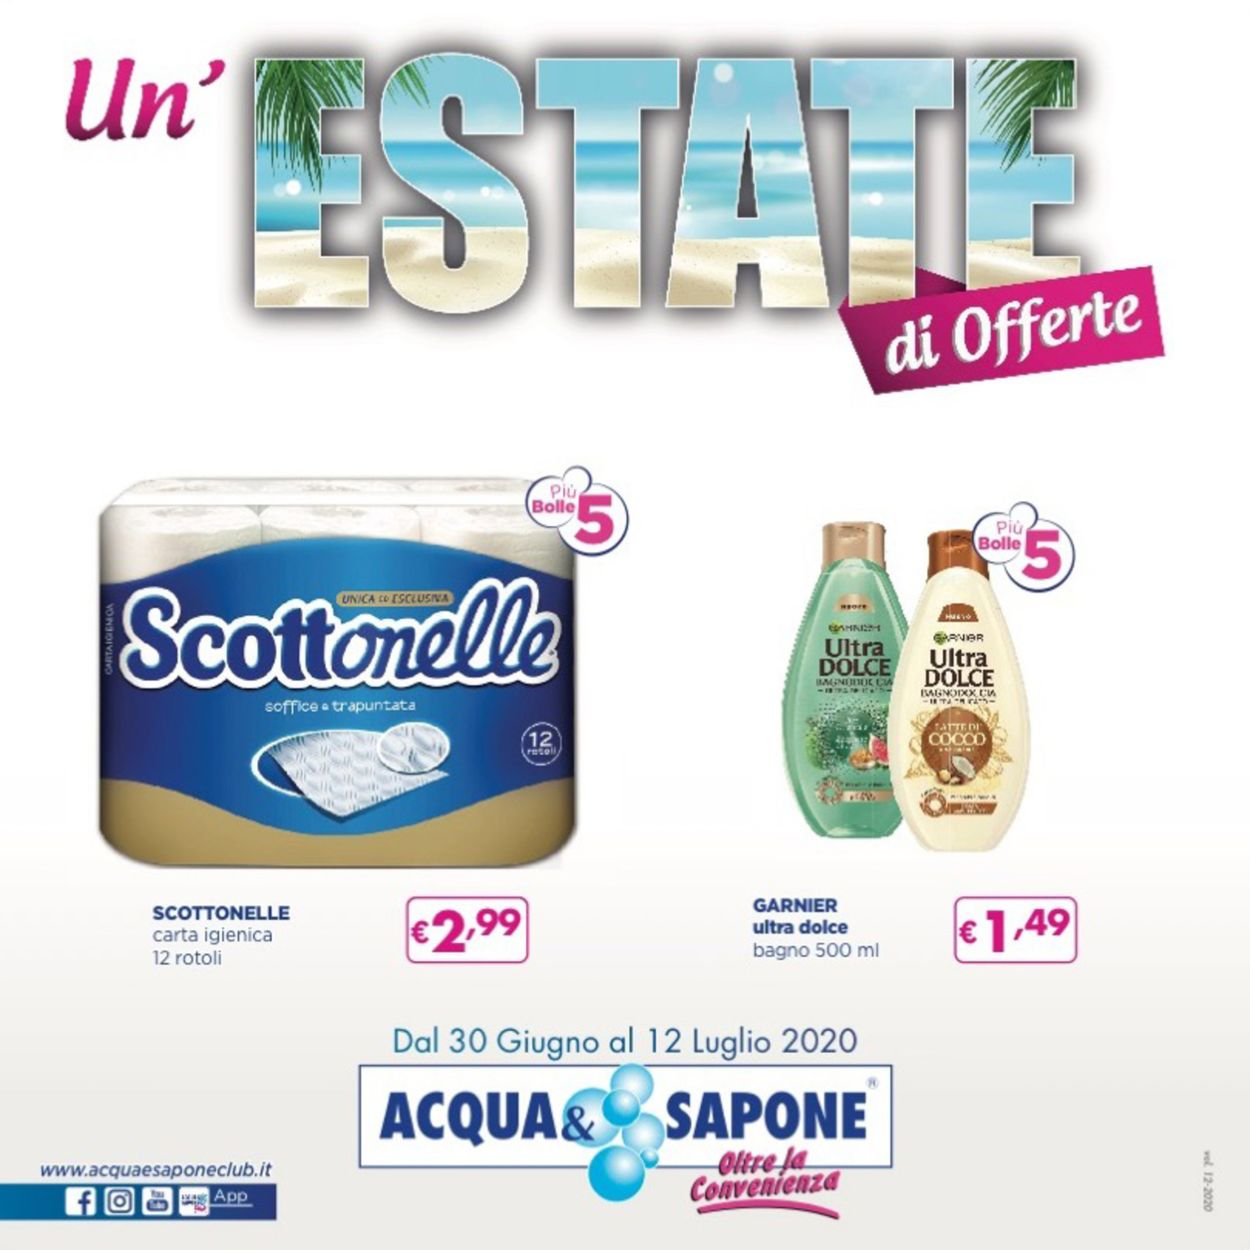 Volantino Acqua & Sapone - Offerte 30/06-12/07/2020